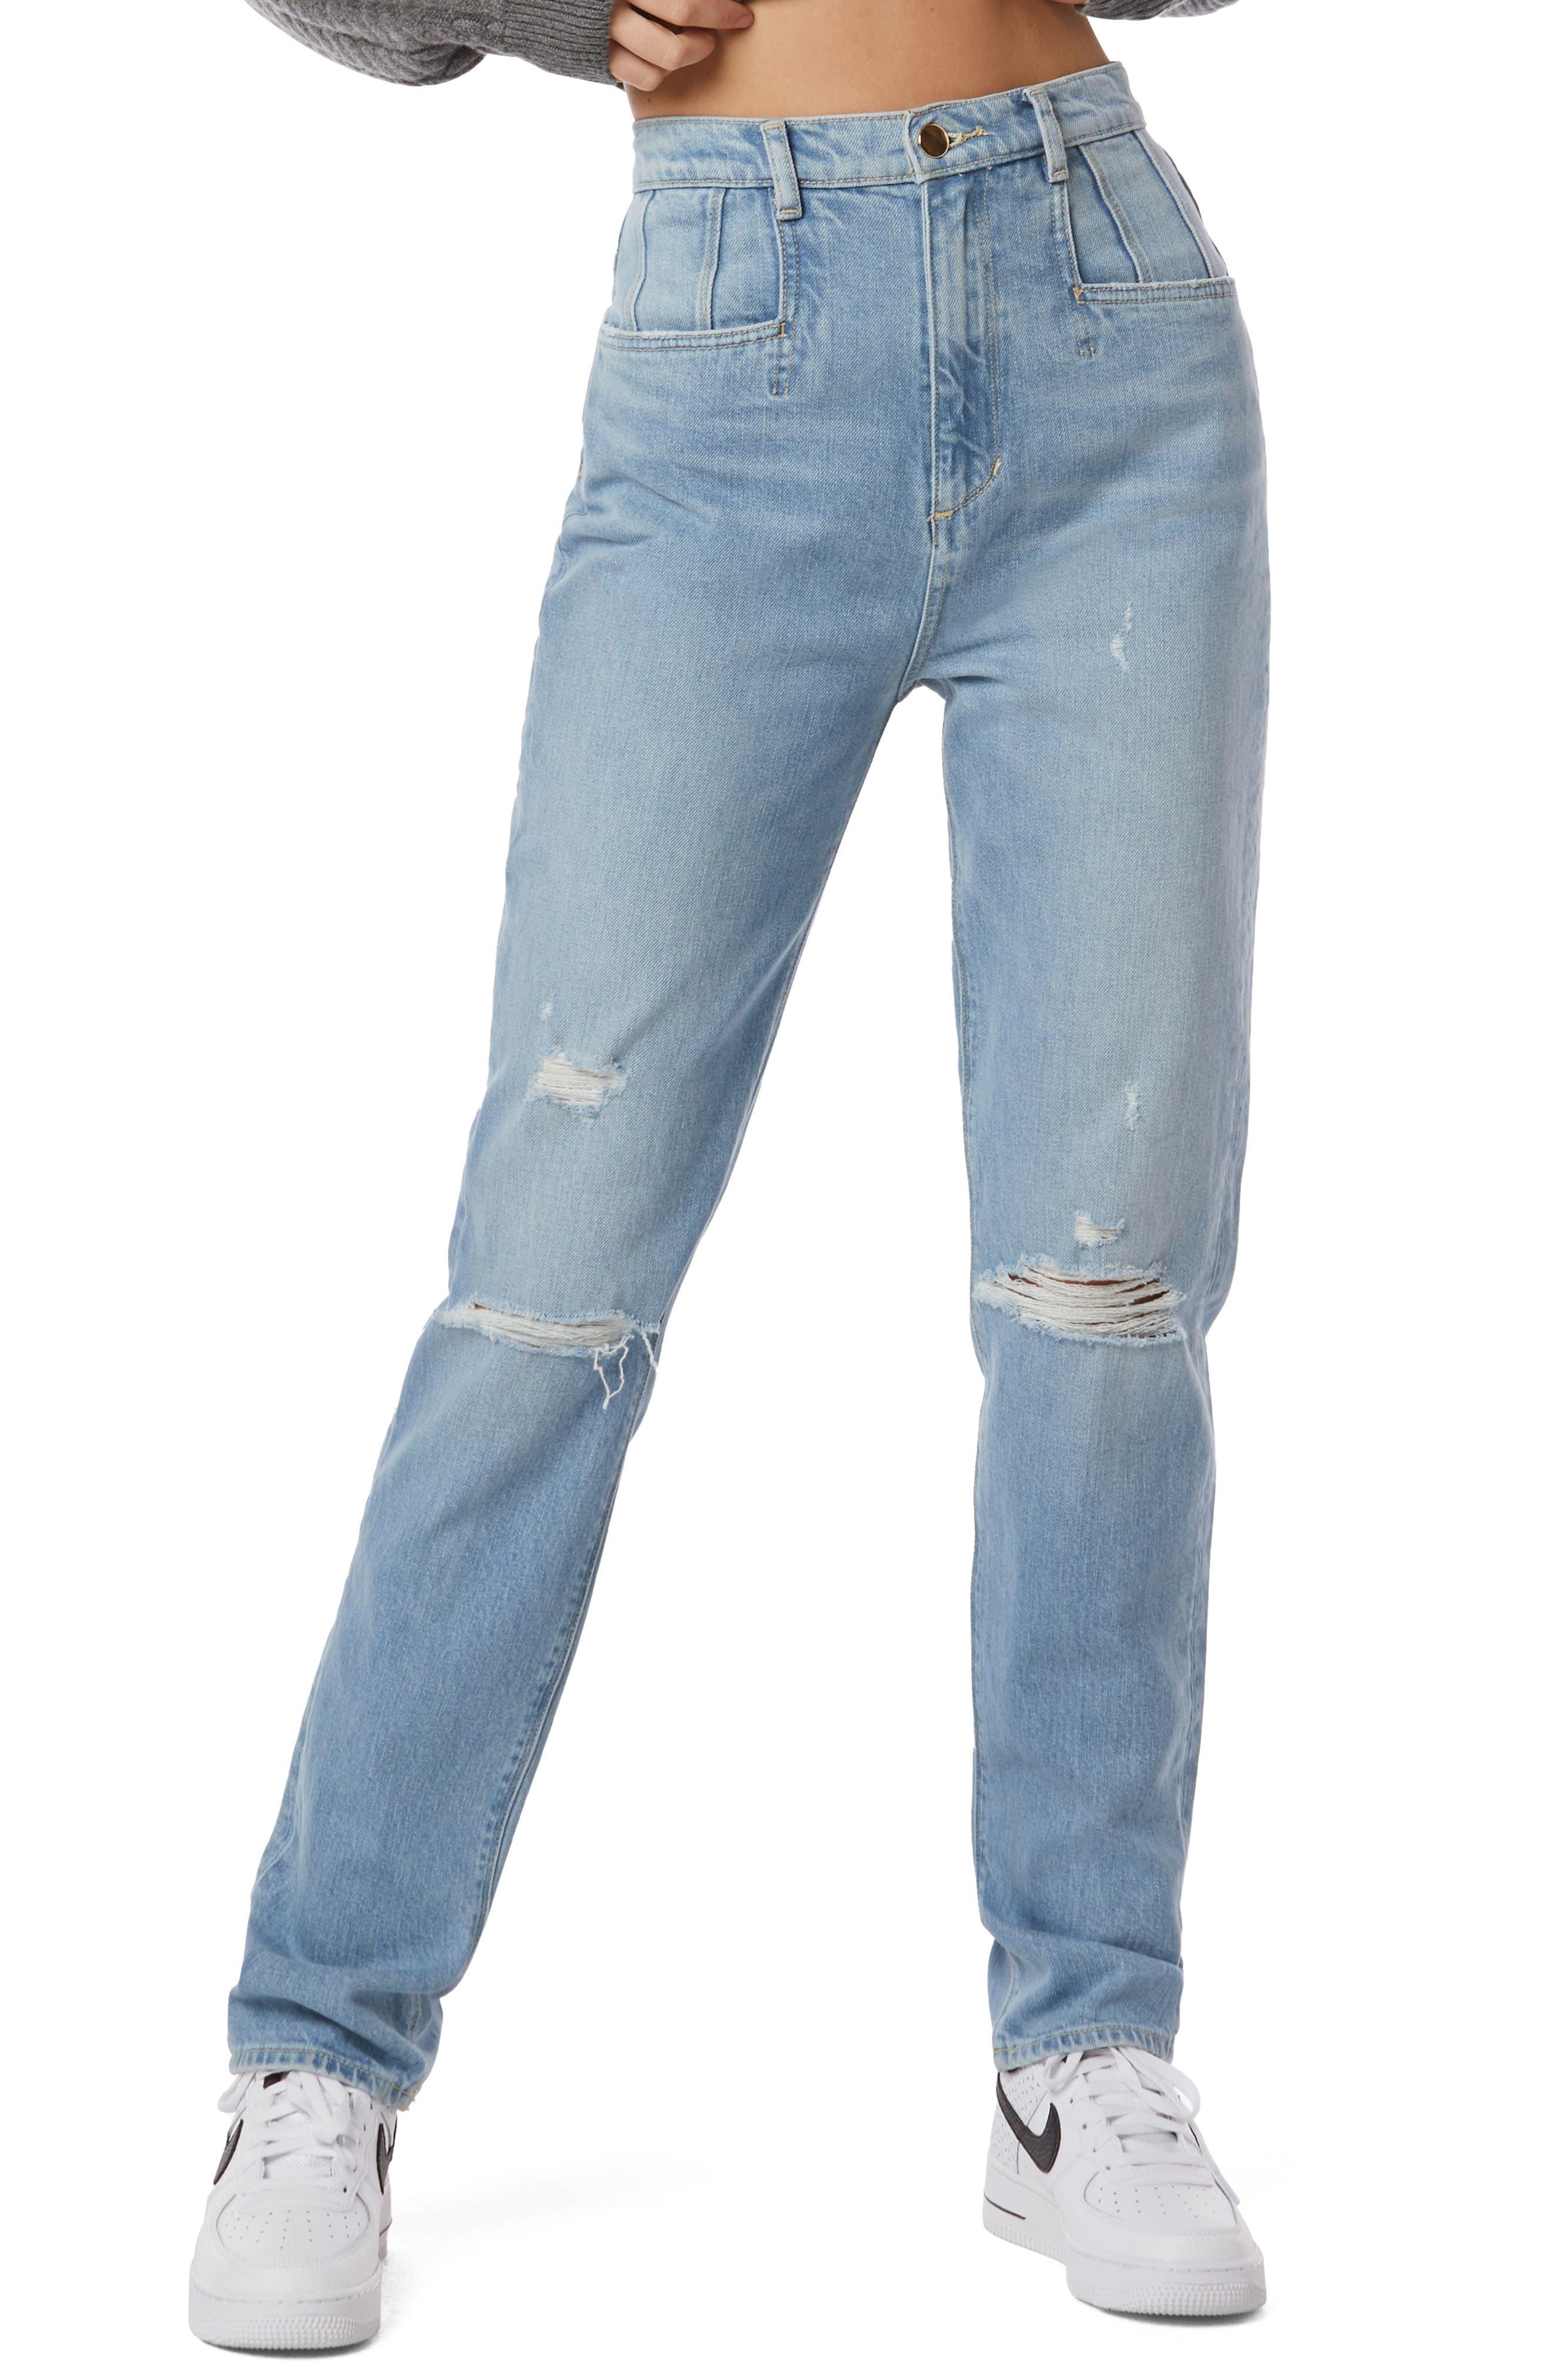 The Jordie Super High Waist Distressed Straight Leg Jeans